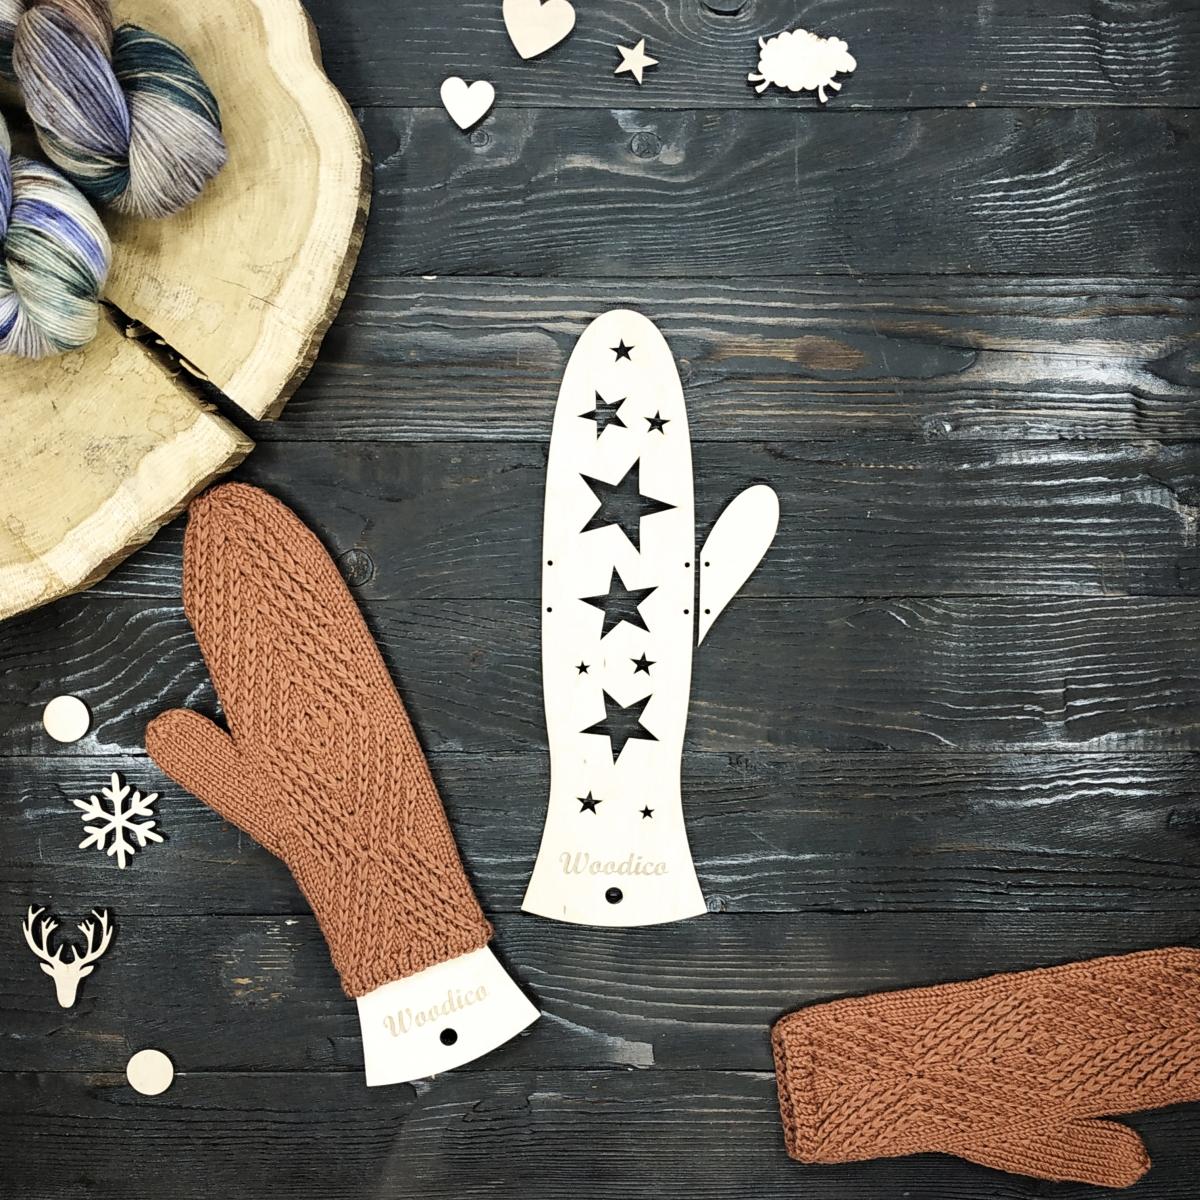 woodico.pro wooden mitten blockers stars 1200x1200 - Wooden mitten blockers / Stars